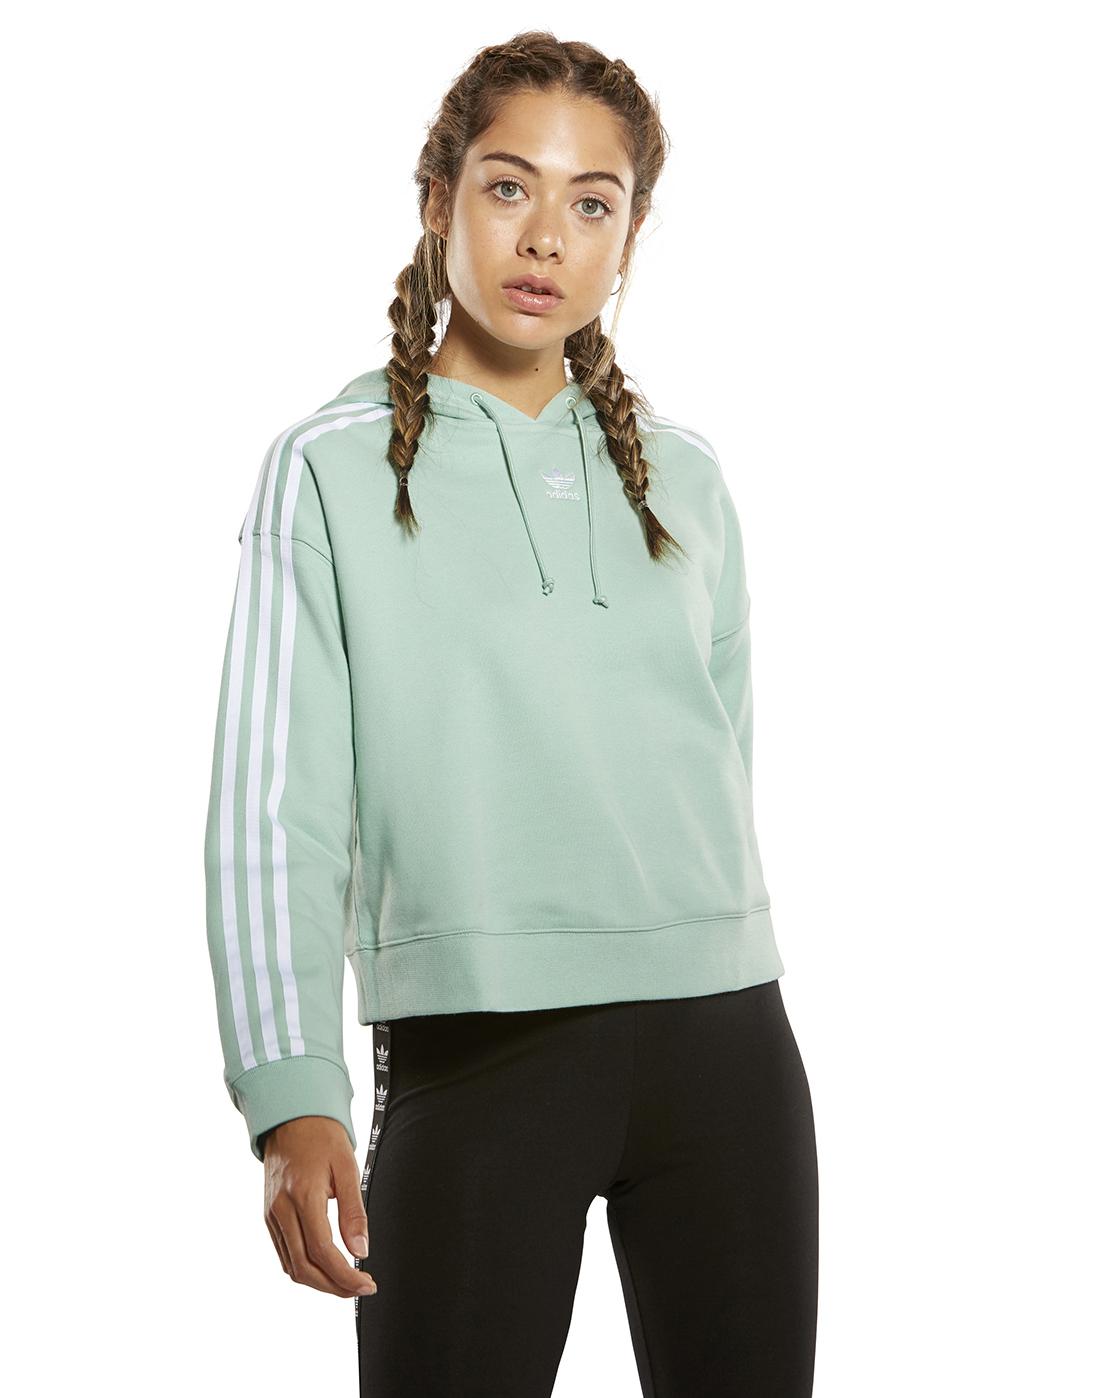 Women S Adidas Originals Cropped Hoody Green Life